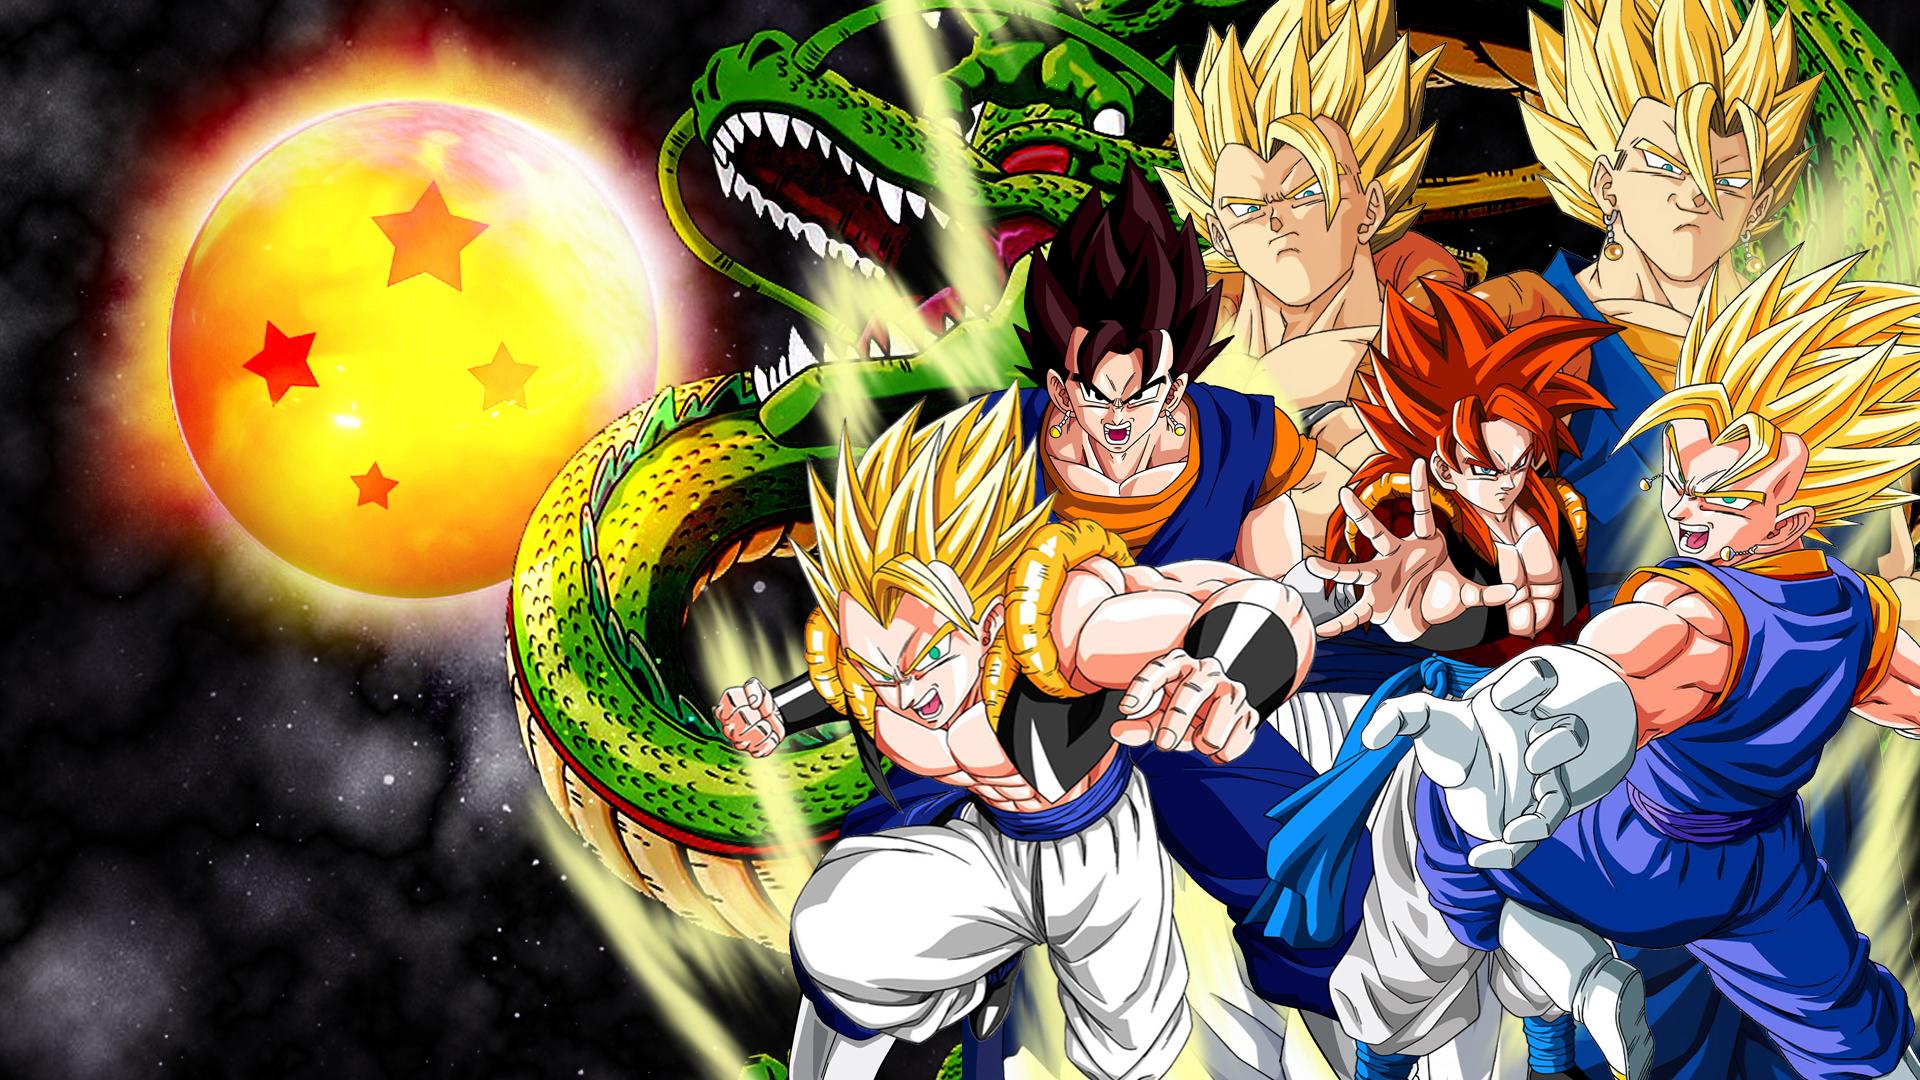 Dragon Ball Z Wallpapers Goku Wallpapers Backgrounds Images Art 1920x1080